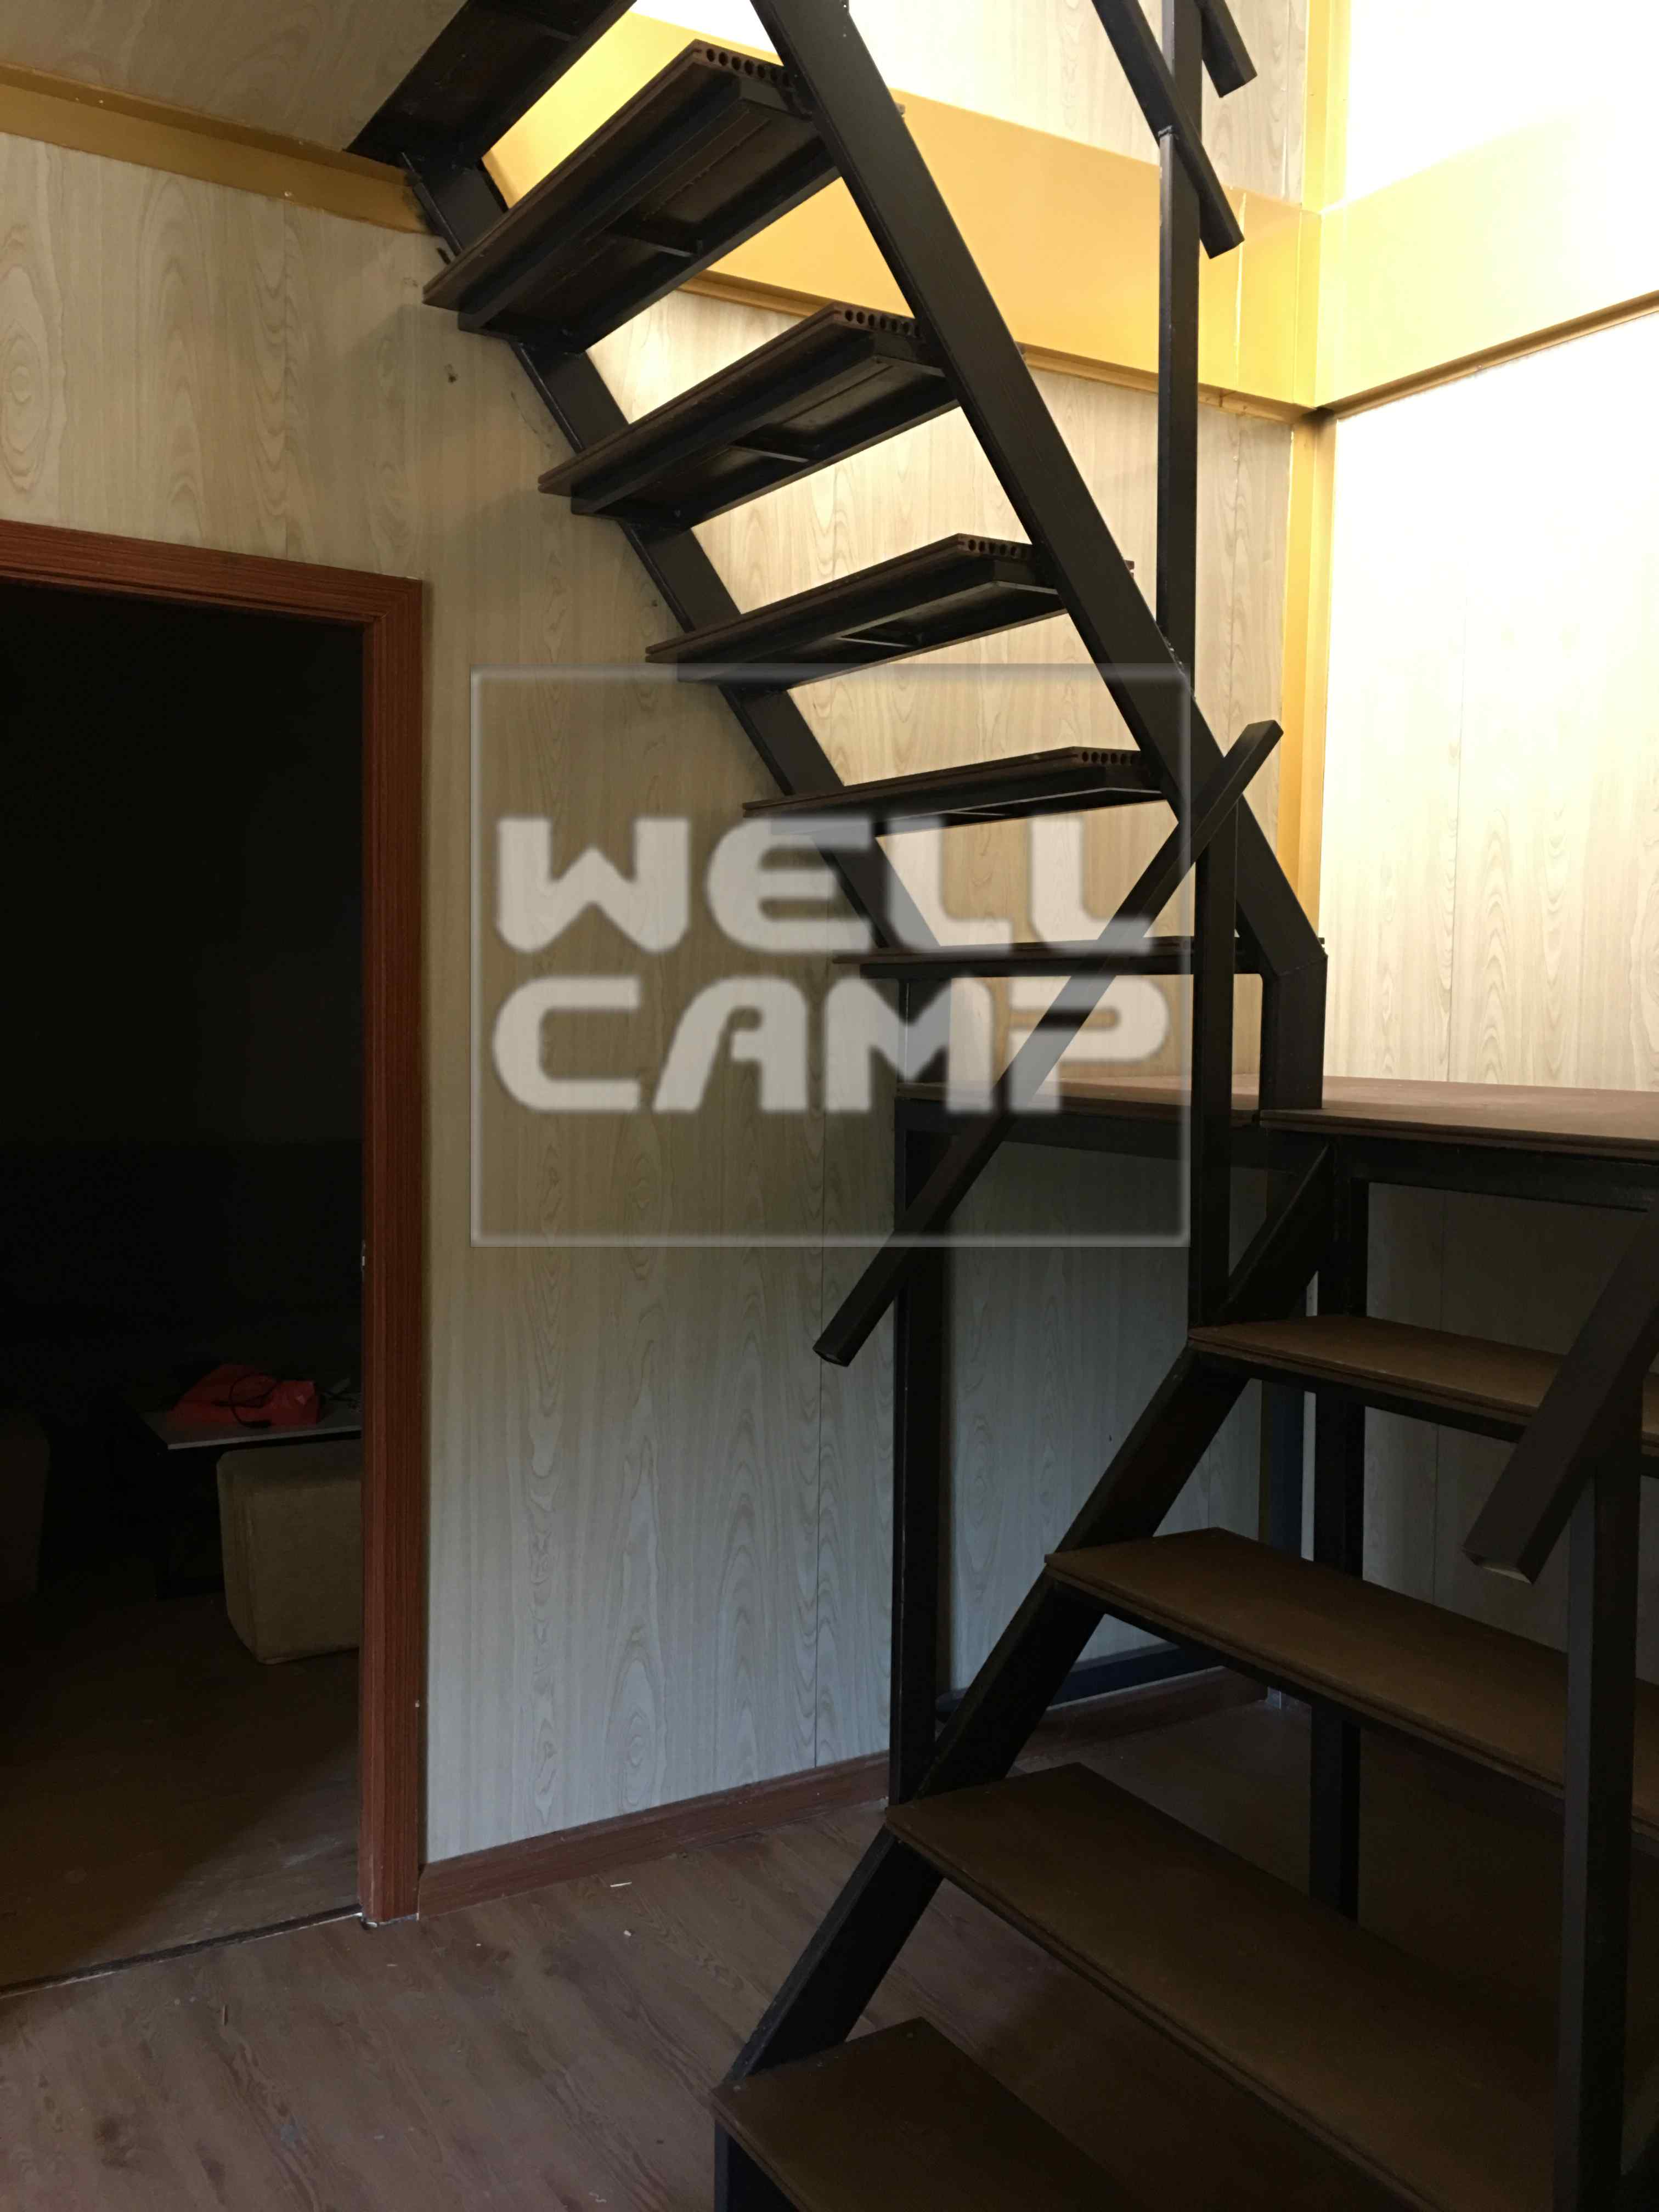 WELLCAMP Array image20